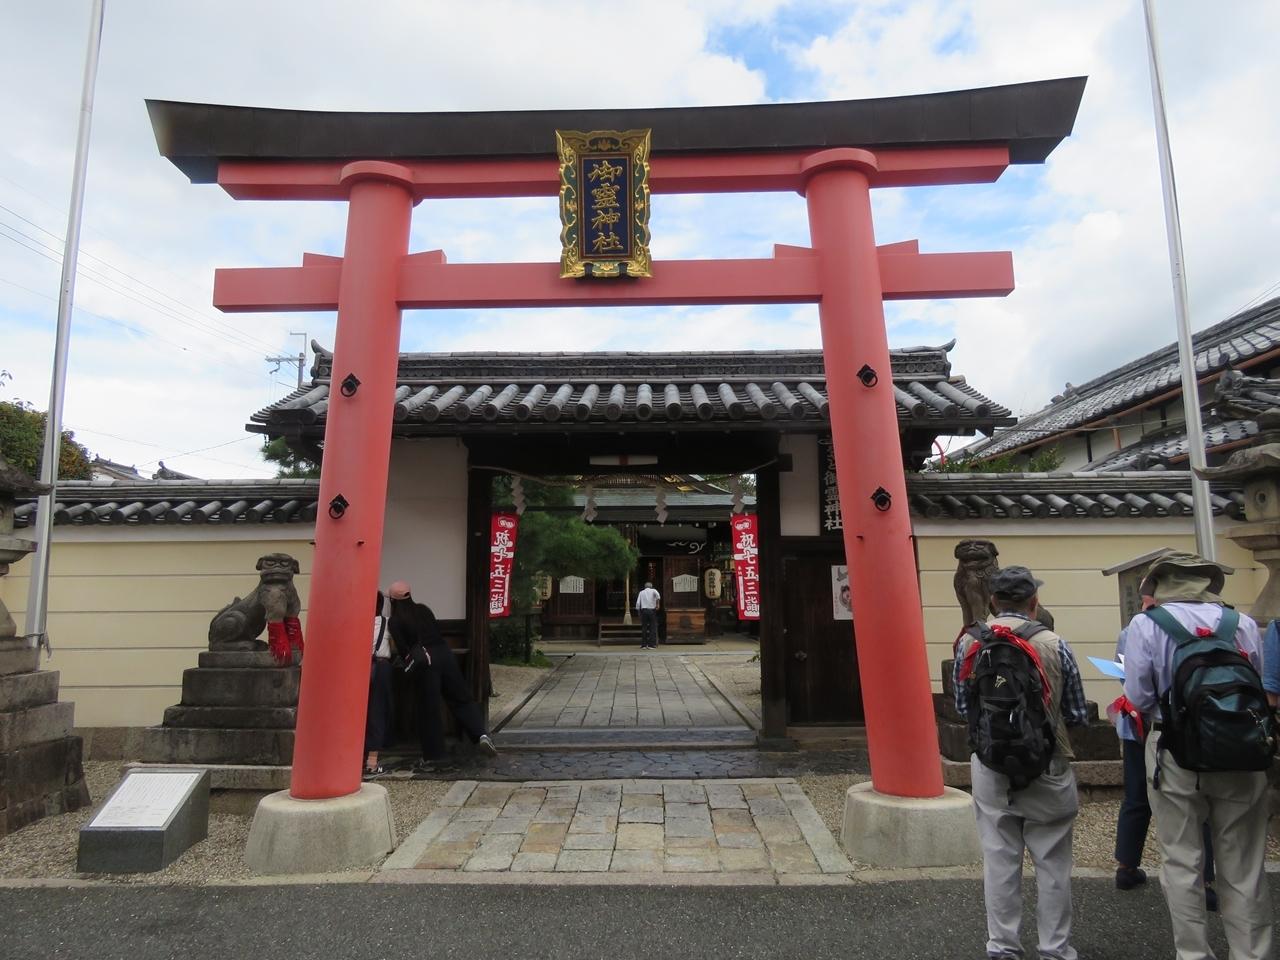 s-御霊神社 ならまち191020